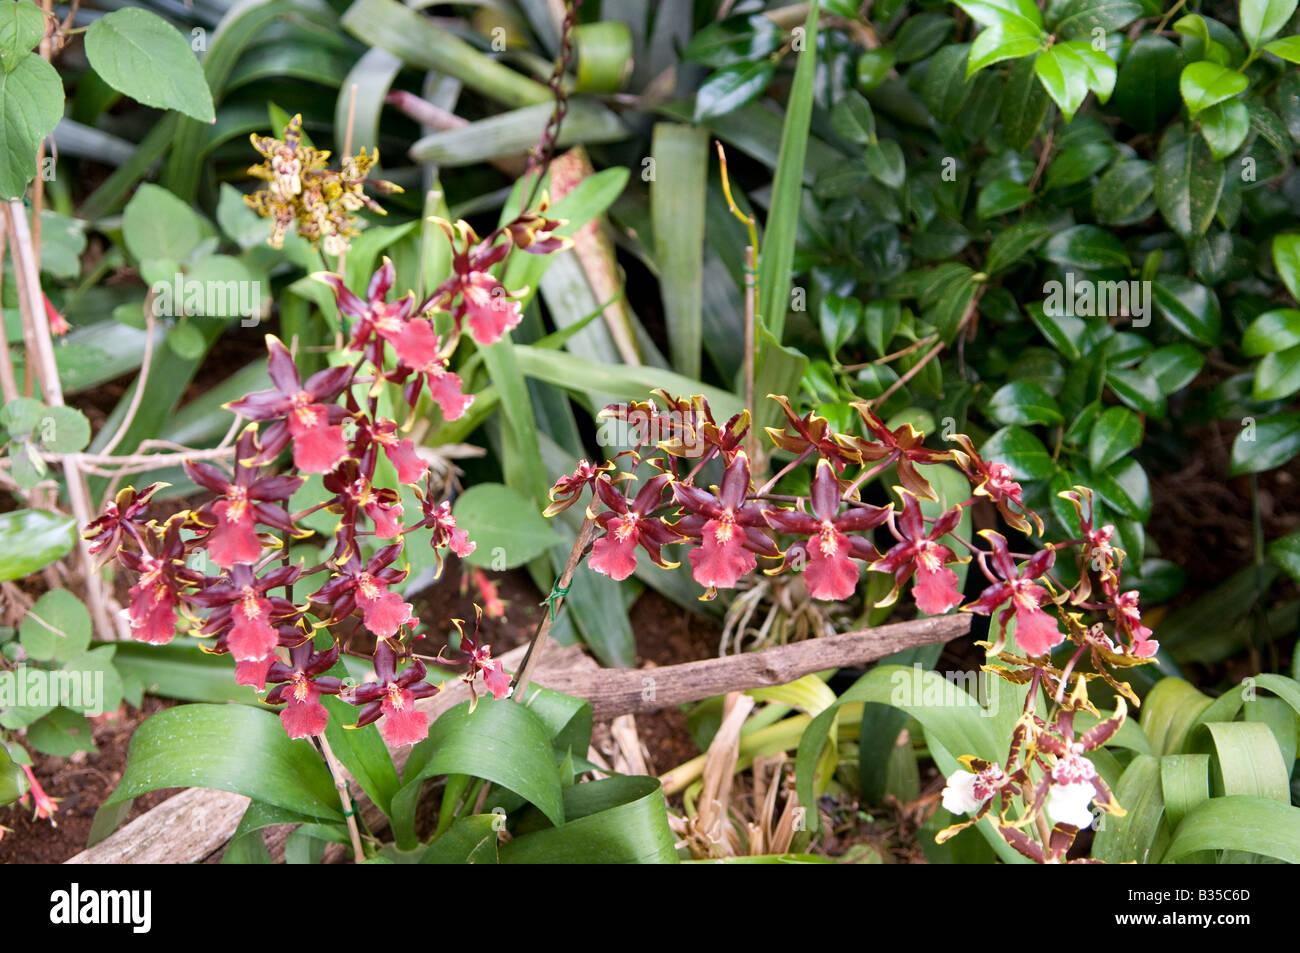 orchidee cattleya stockfoto bild 19173685 alamy. Black Bedroom Furniture Sets. Home Design Ideas